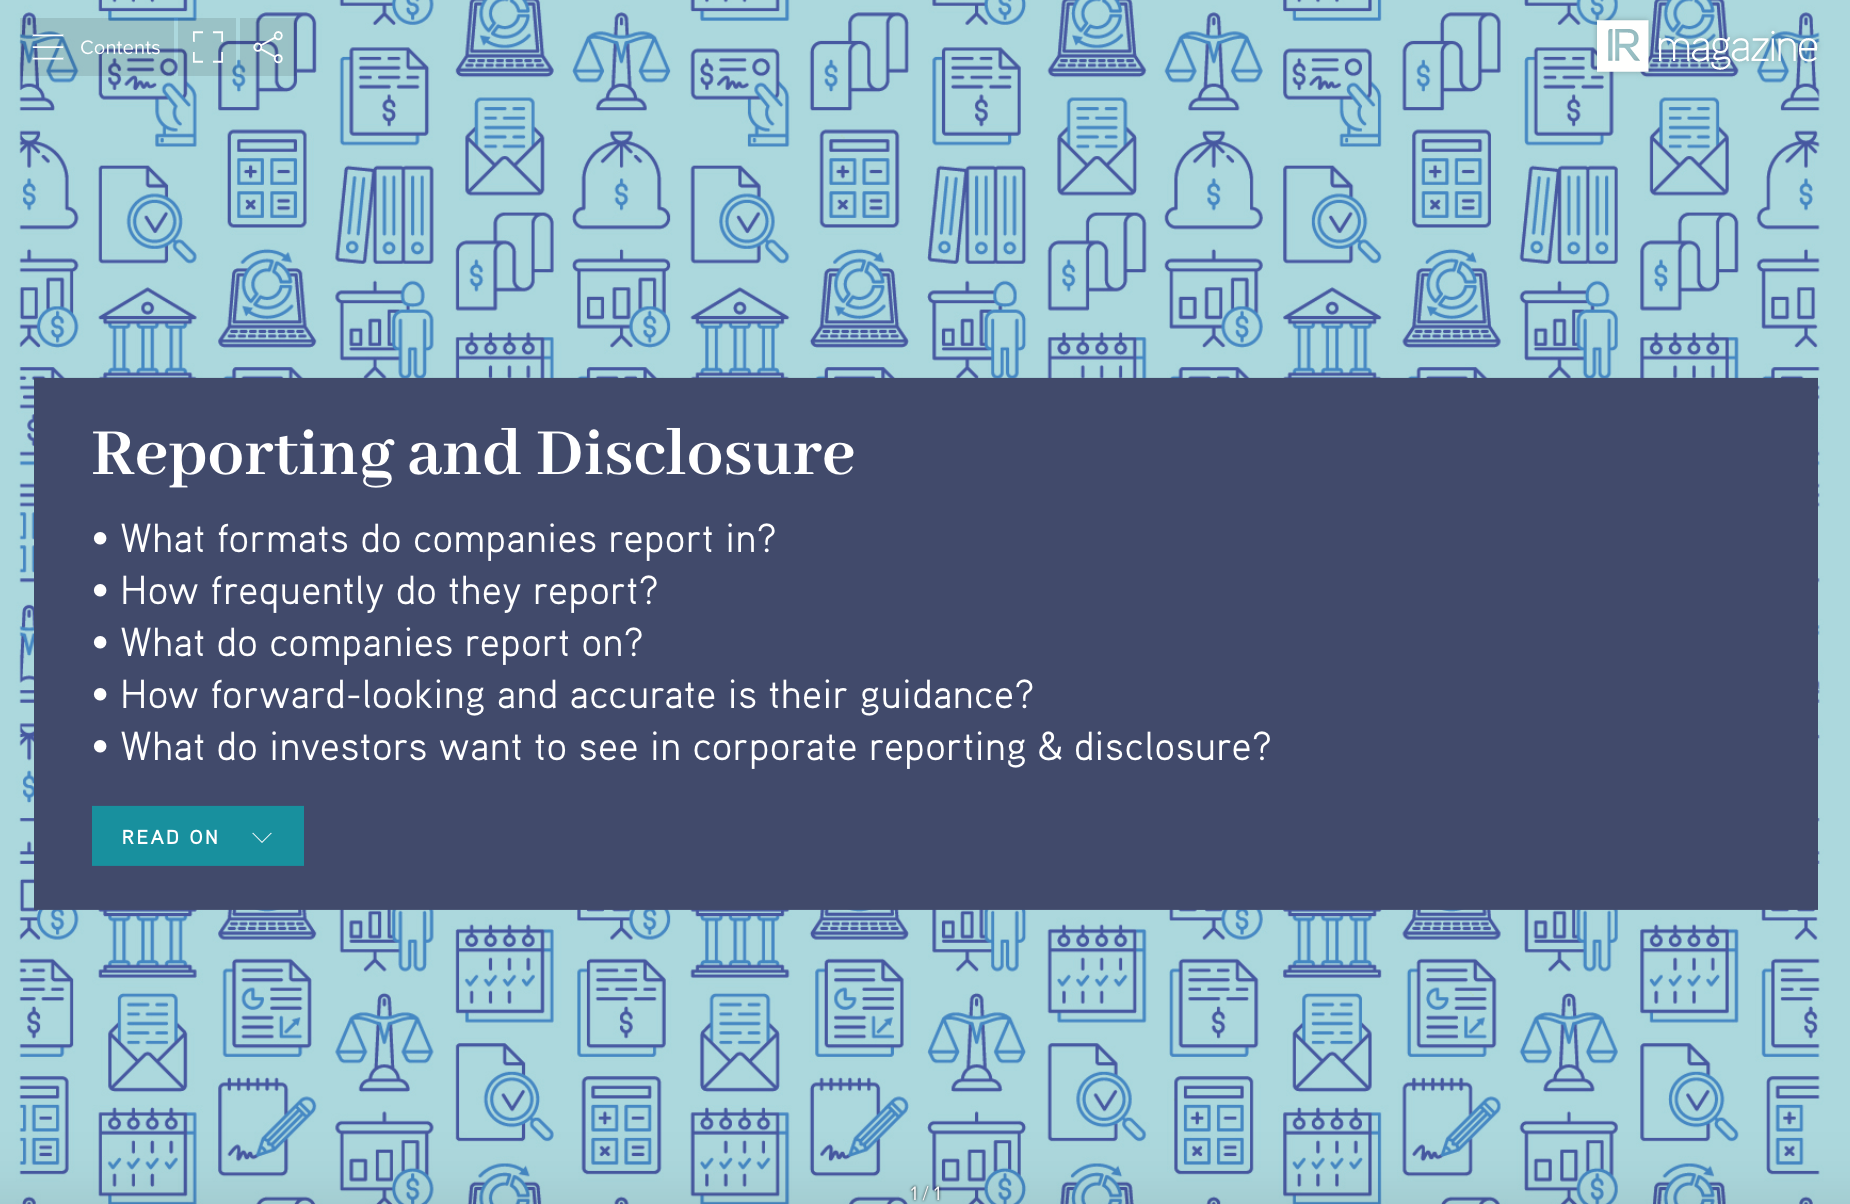 Reporting Disclosure research report